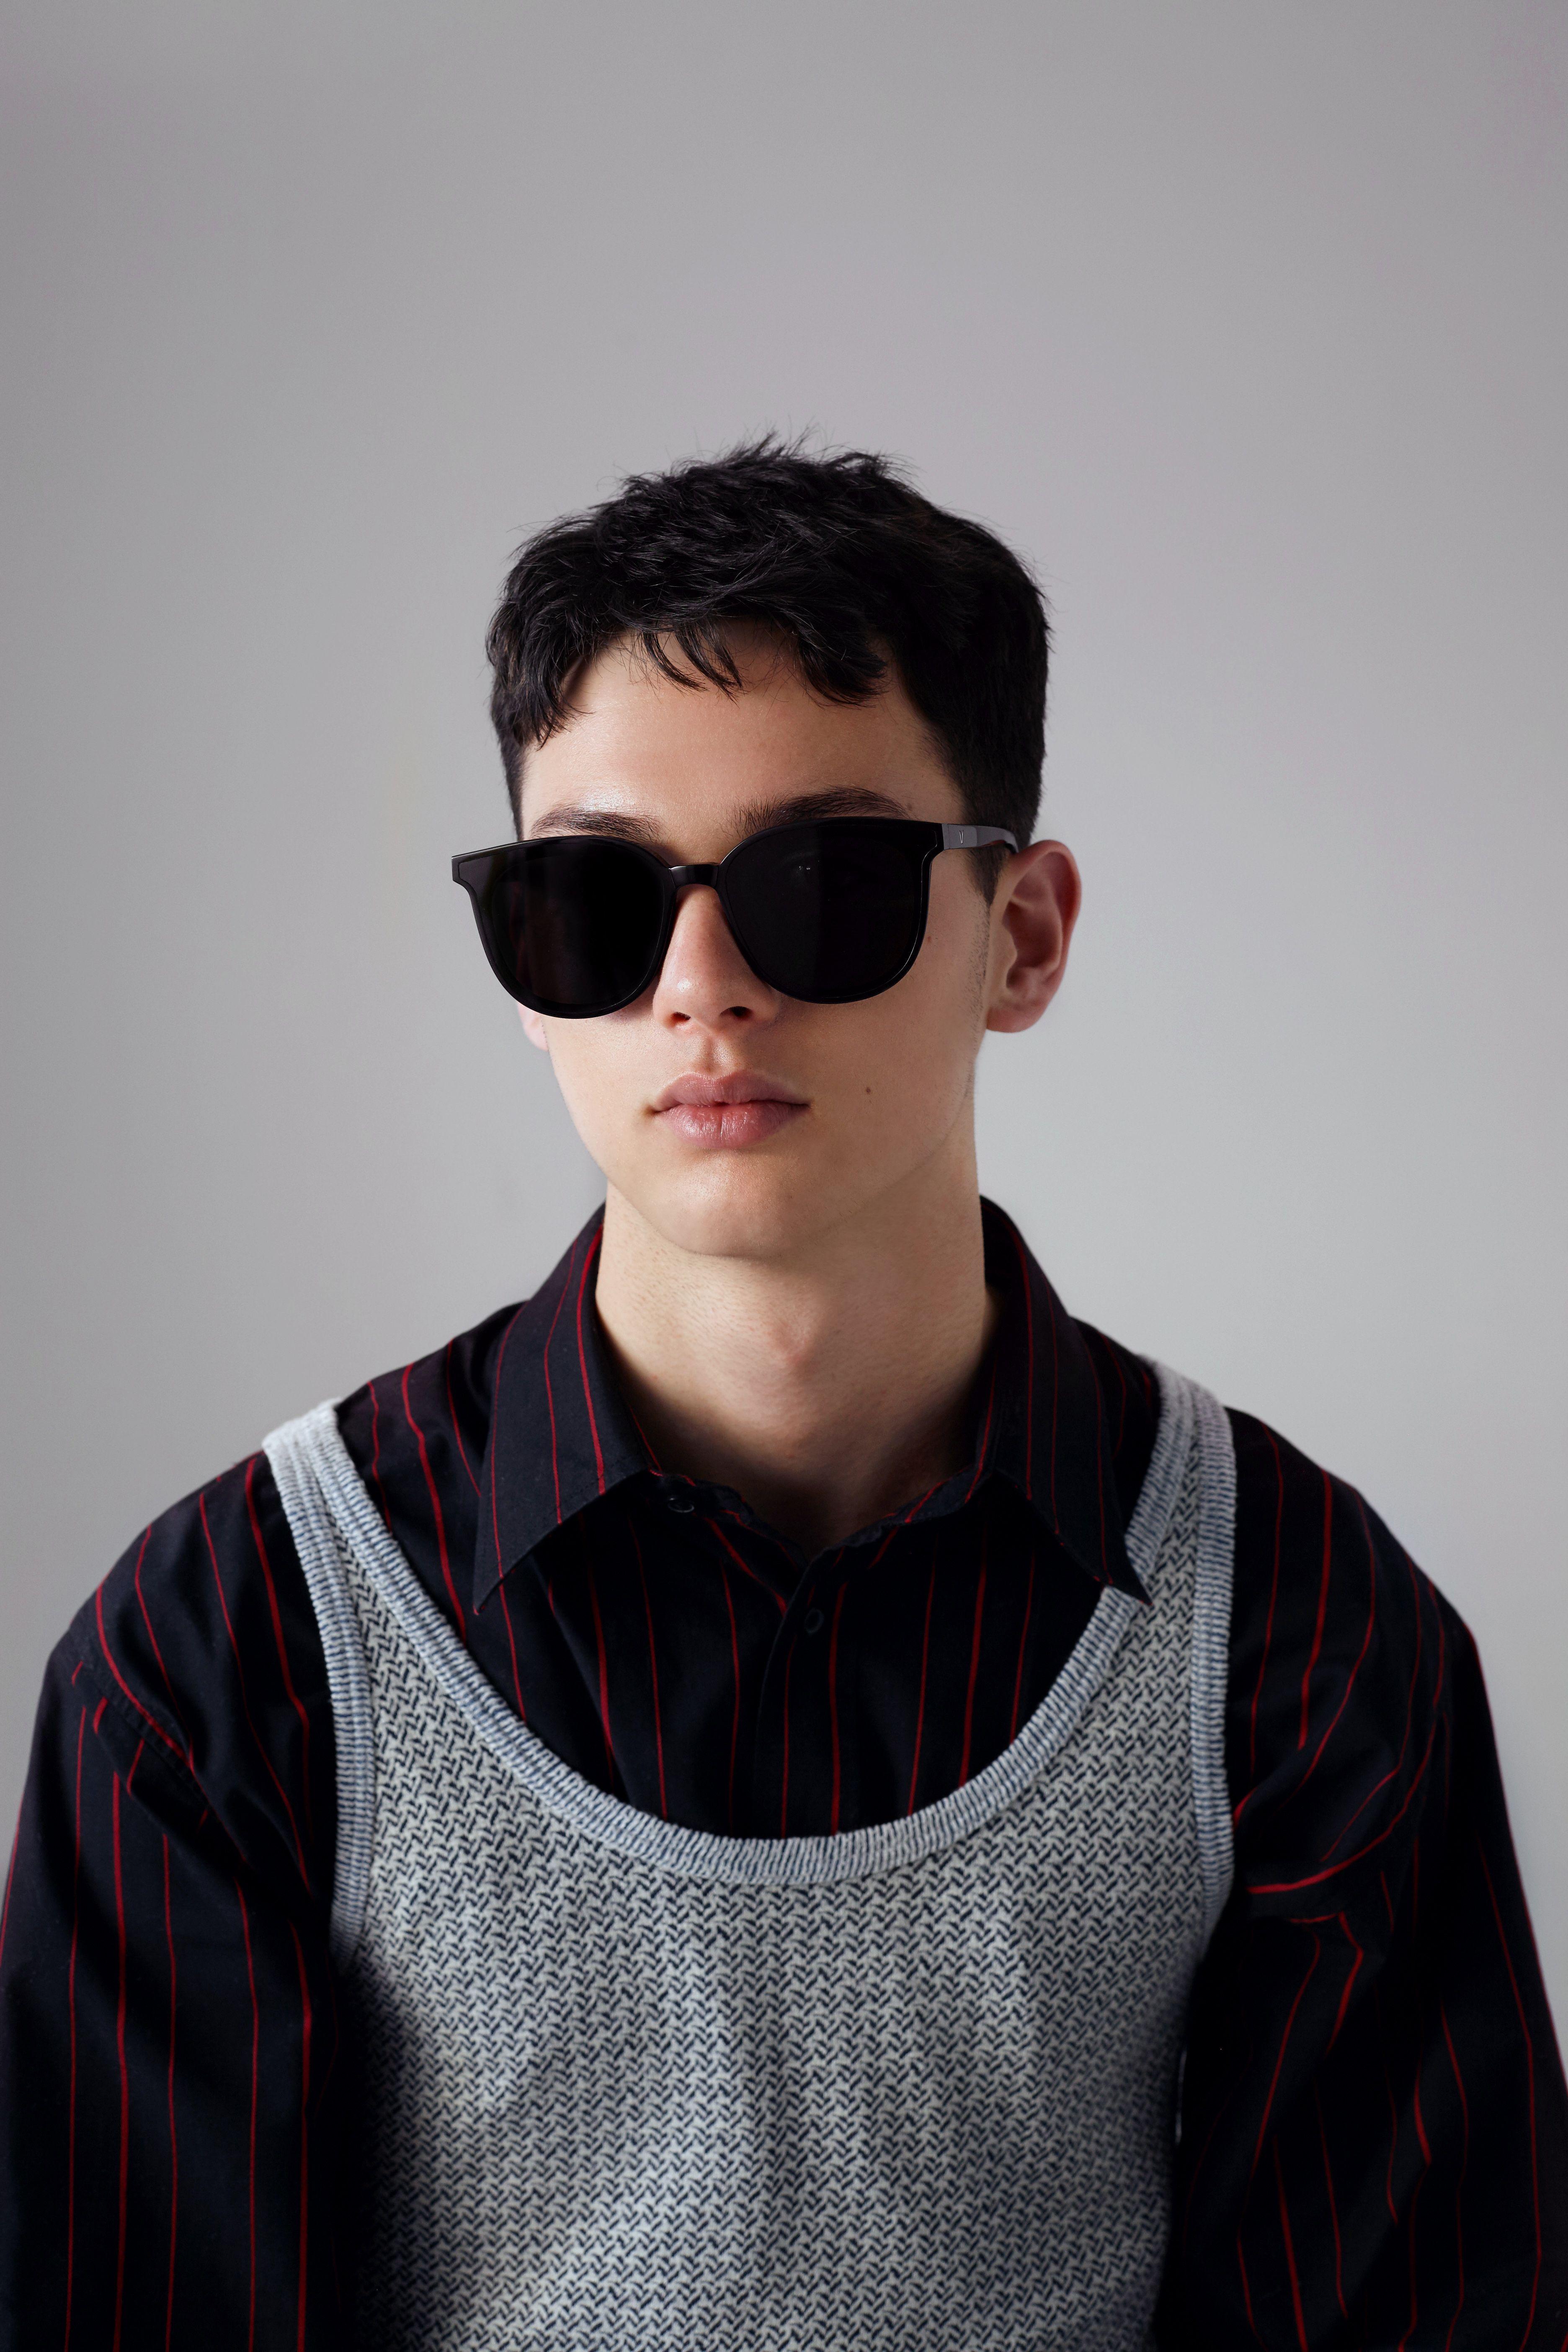 ba9f0350f5 2018 NEW SUNGLASSES LOOKBOOK Ma Mars 01  gentlemonster  sunglasses   lookbook  redwideopen  fashion  mamars